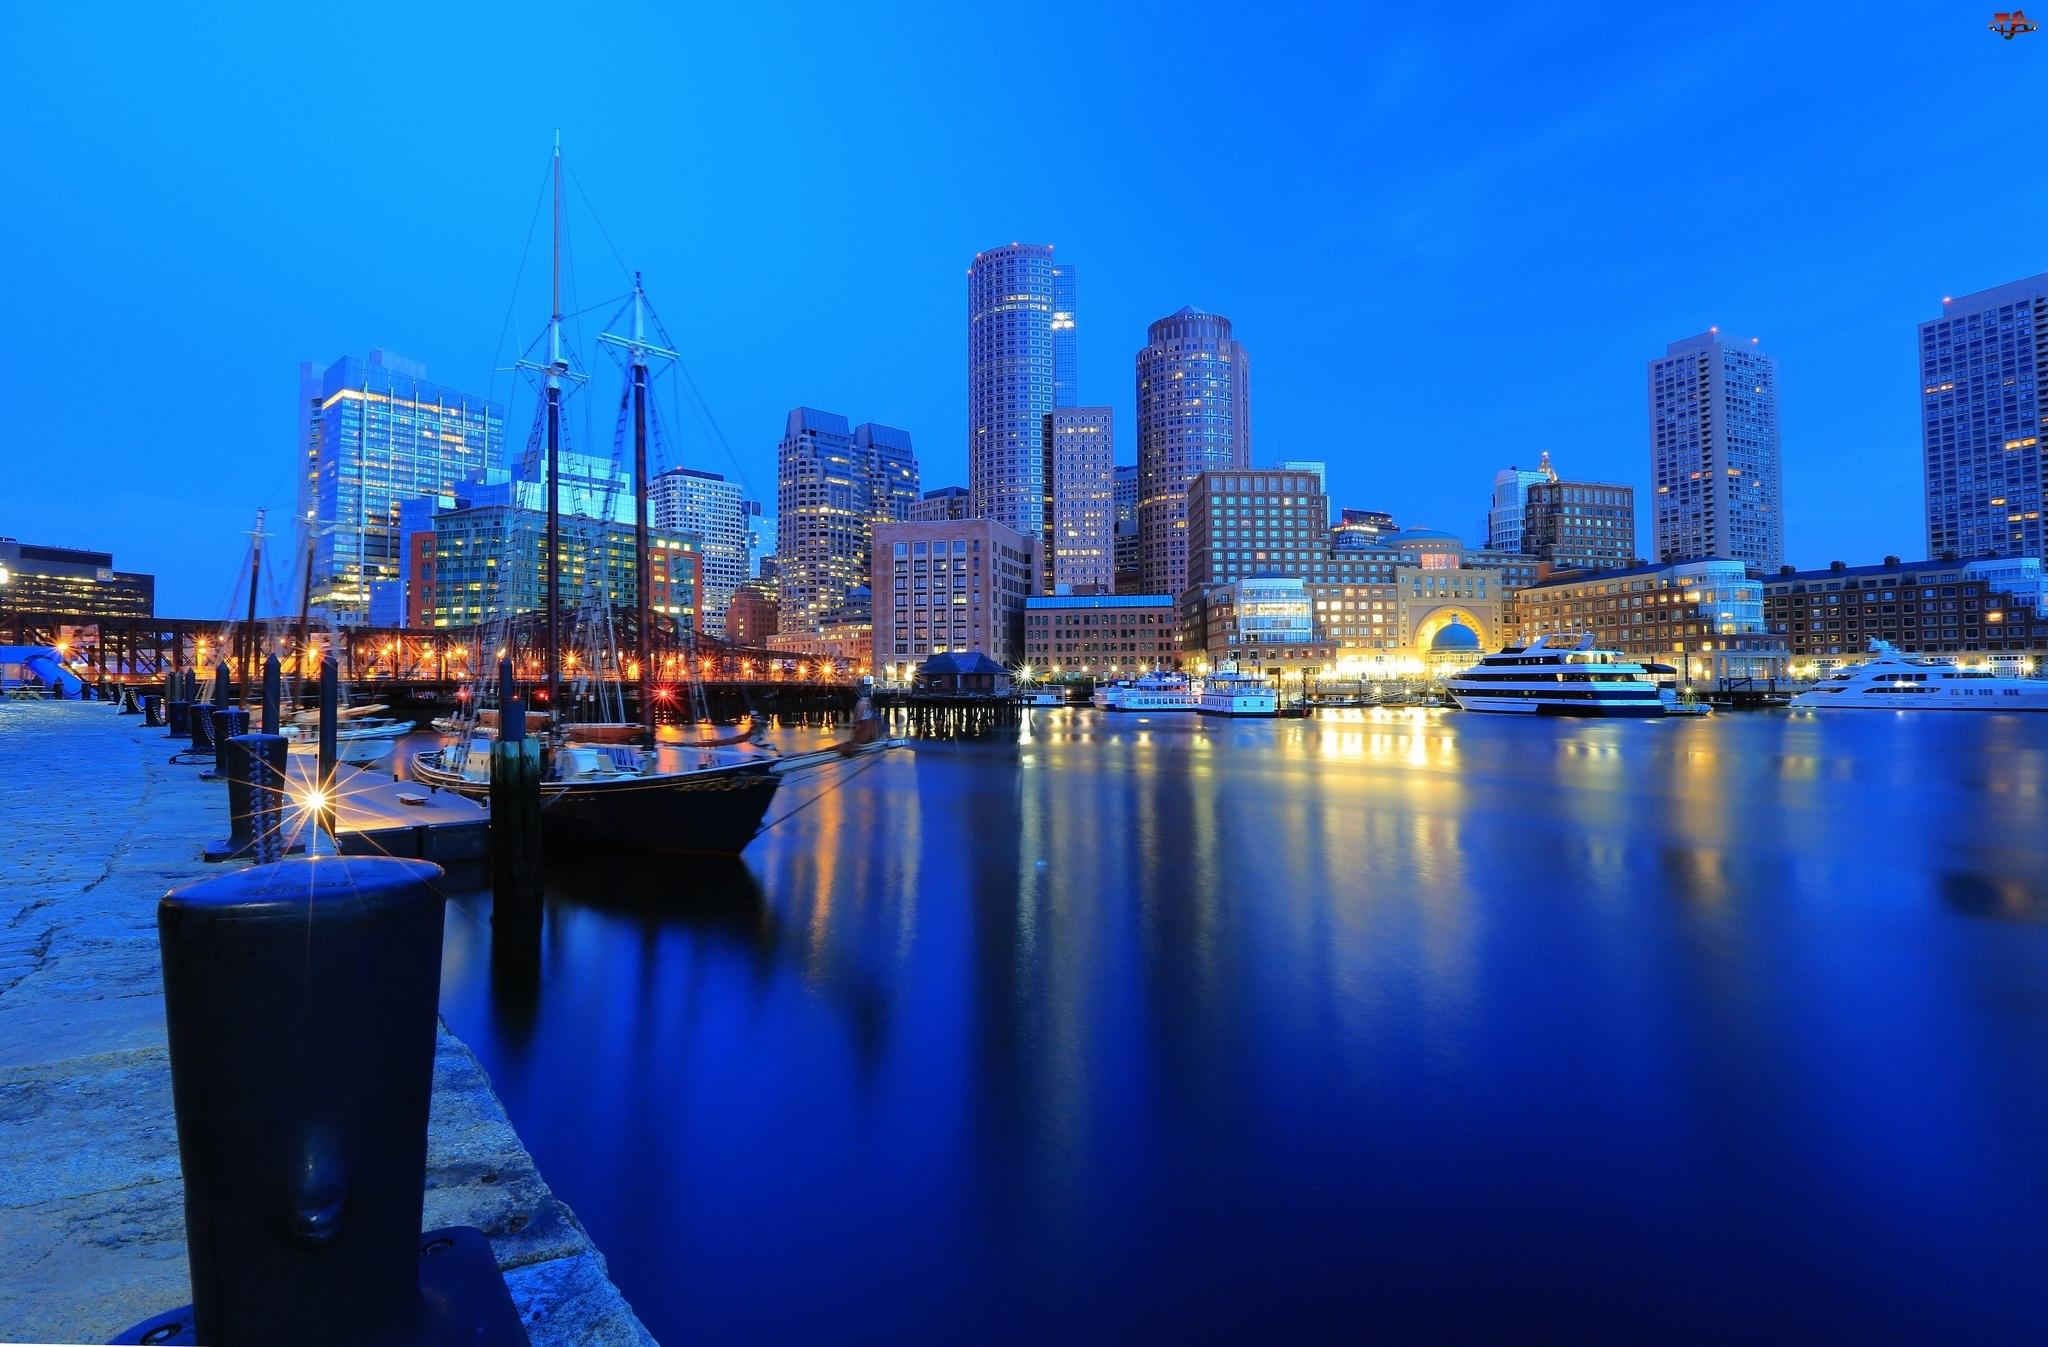 USA, Boston, Port